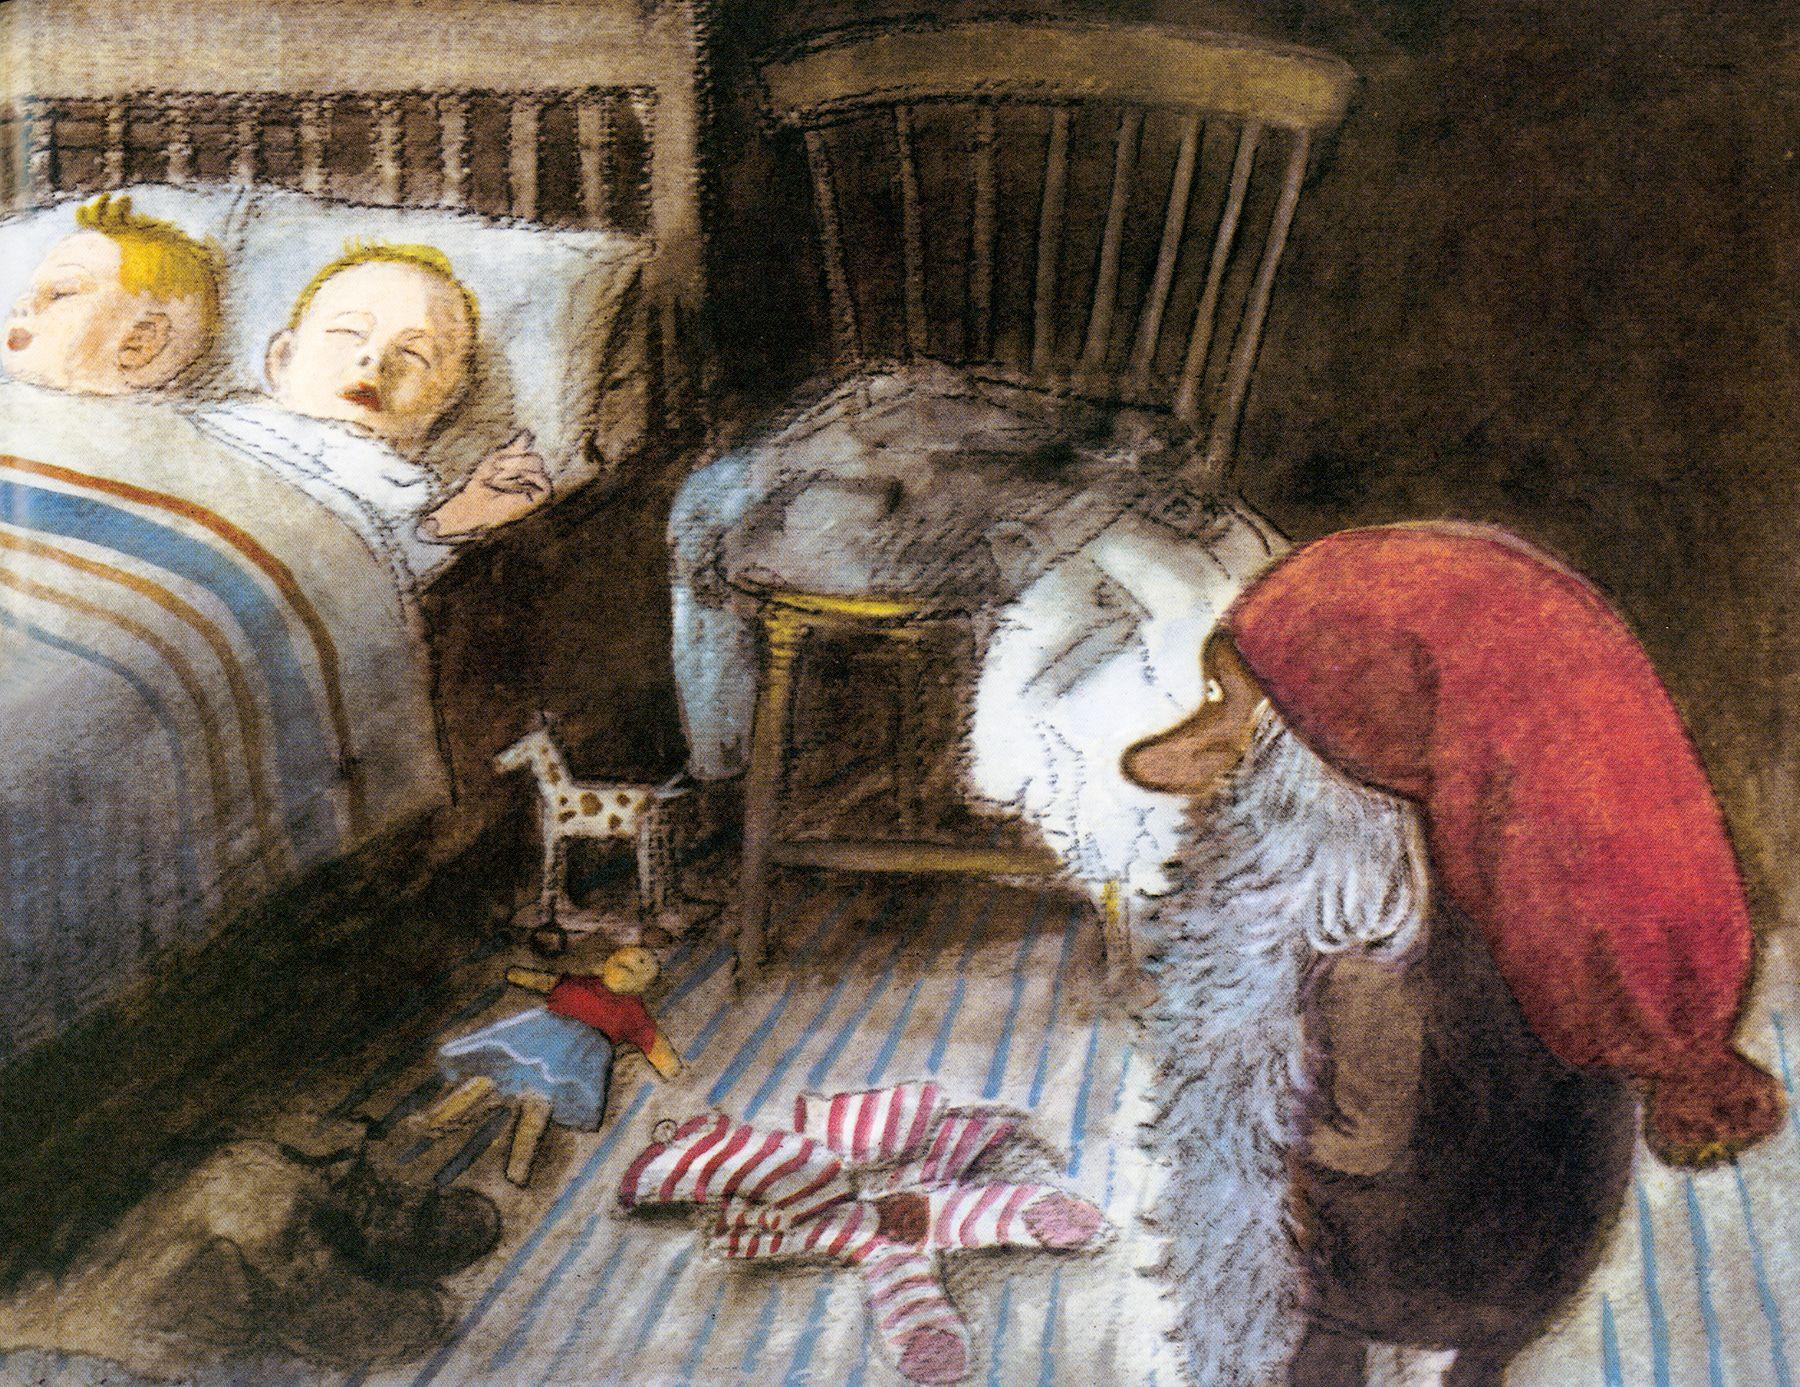 Tomte Tummetott By Astrid Lindgren Illustration By Harald Wiberg